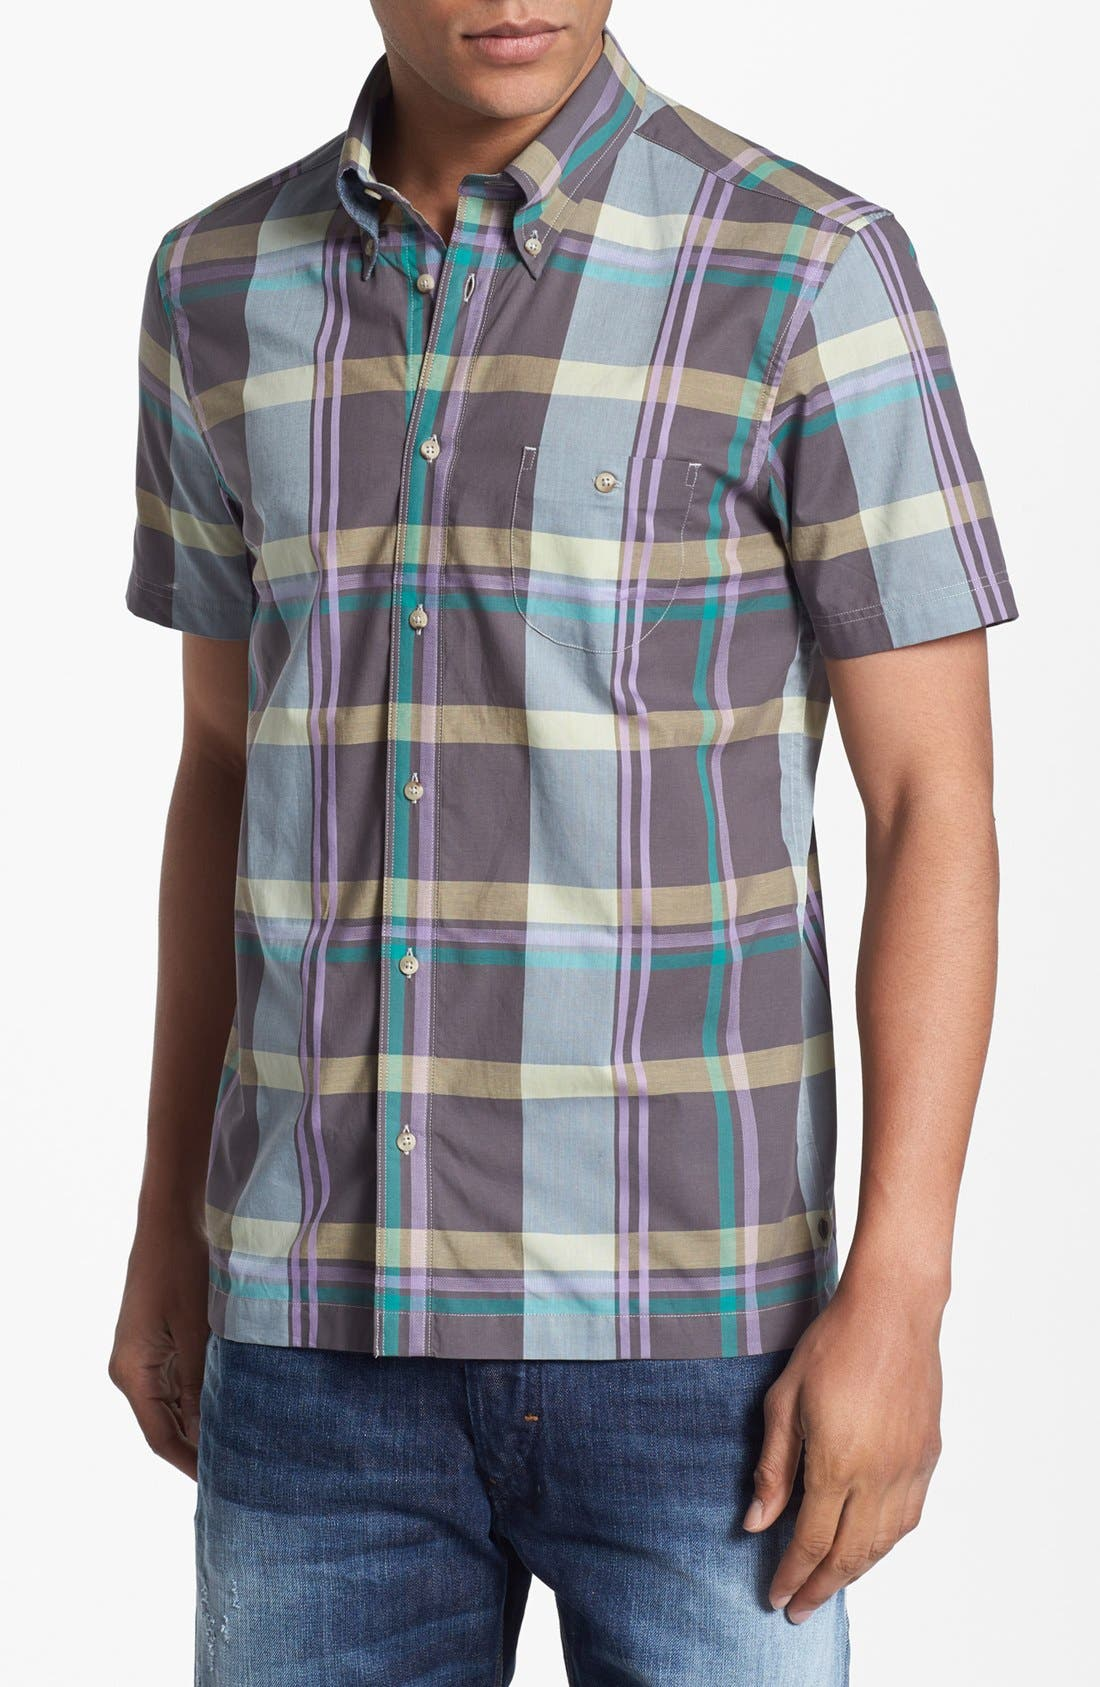 Main Image - Ben Sherman Plaid Short Sleeve Woven Shirt